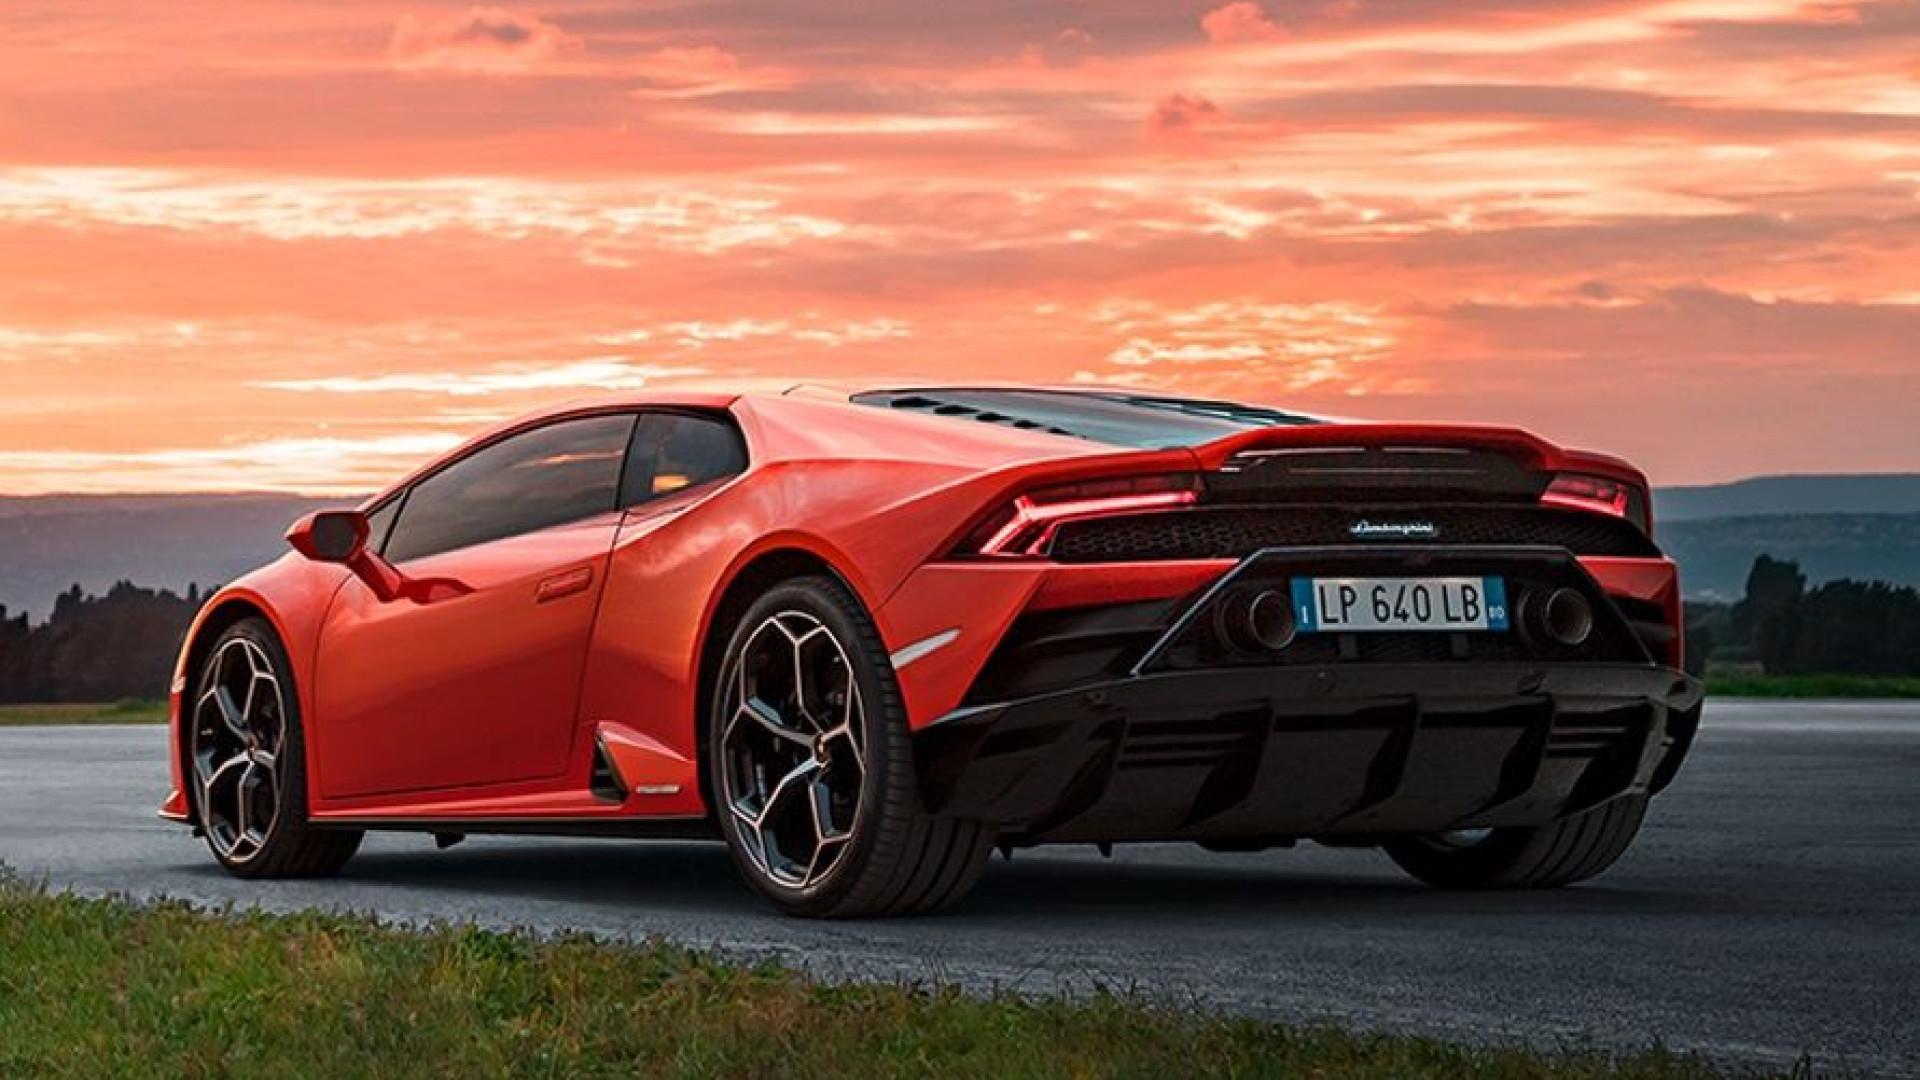 Revelado: Lamborghini Huracán Evo já viu a luz do dia